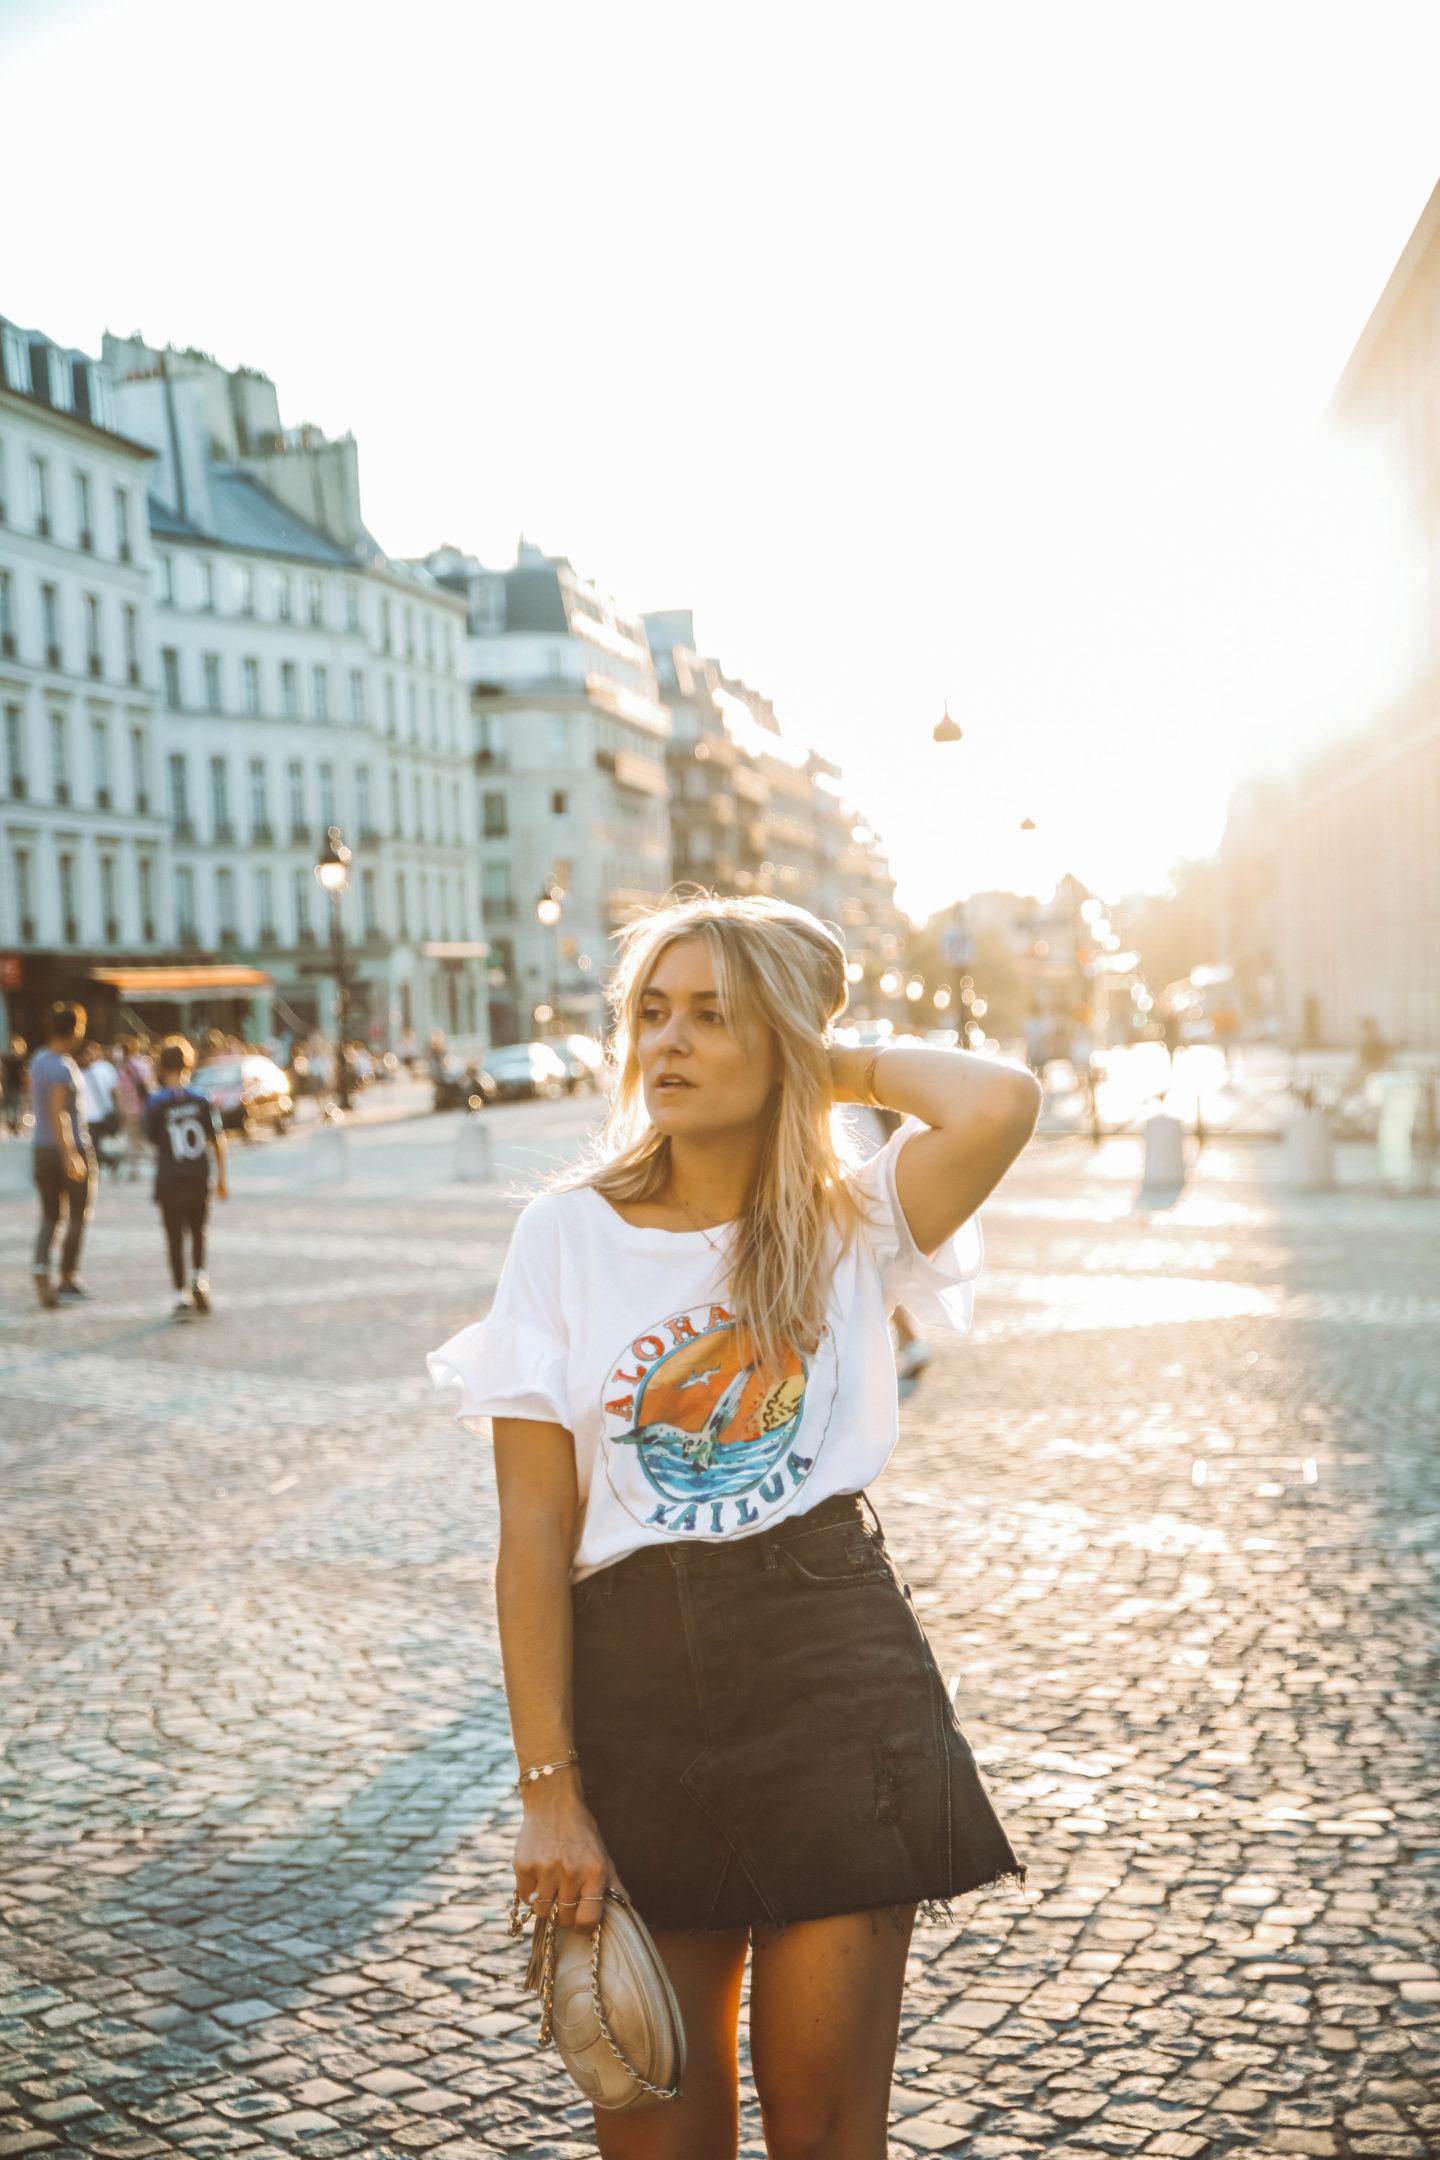 Leon and Harper top - Blondie Baby blog mode Paris et voyages